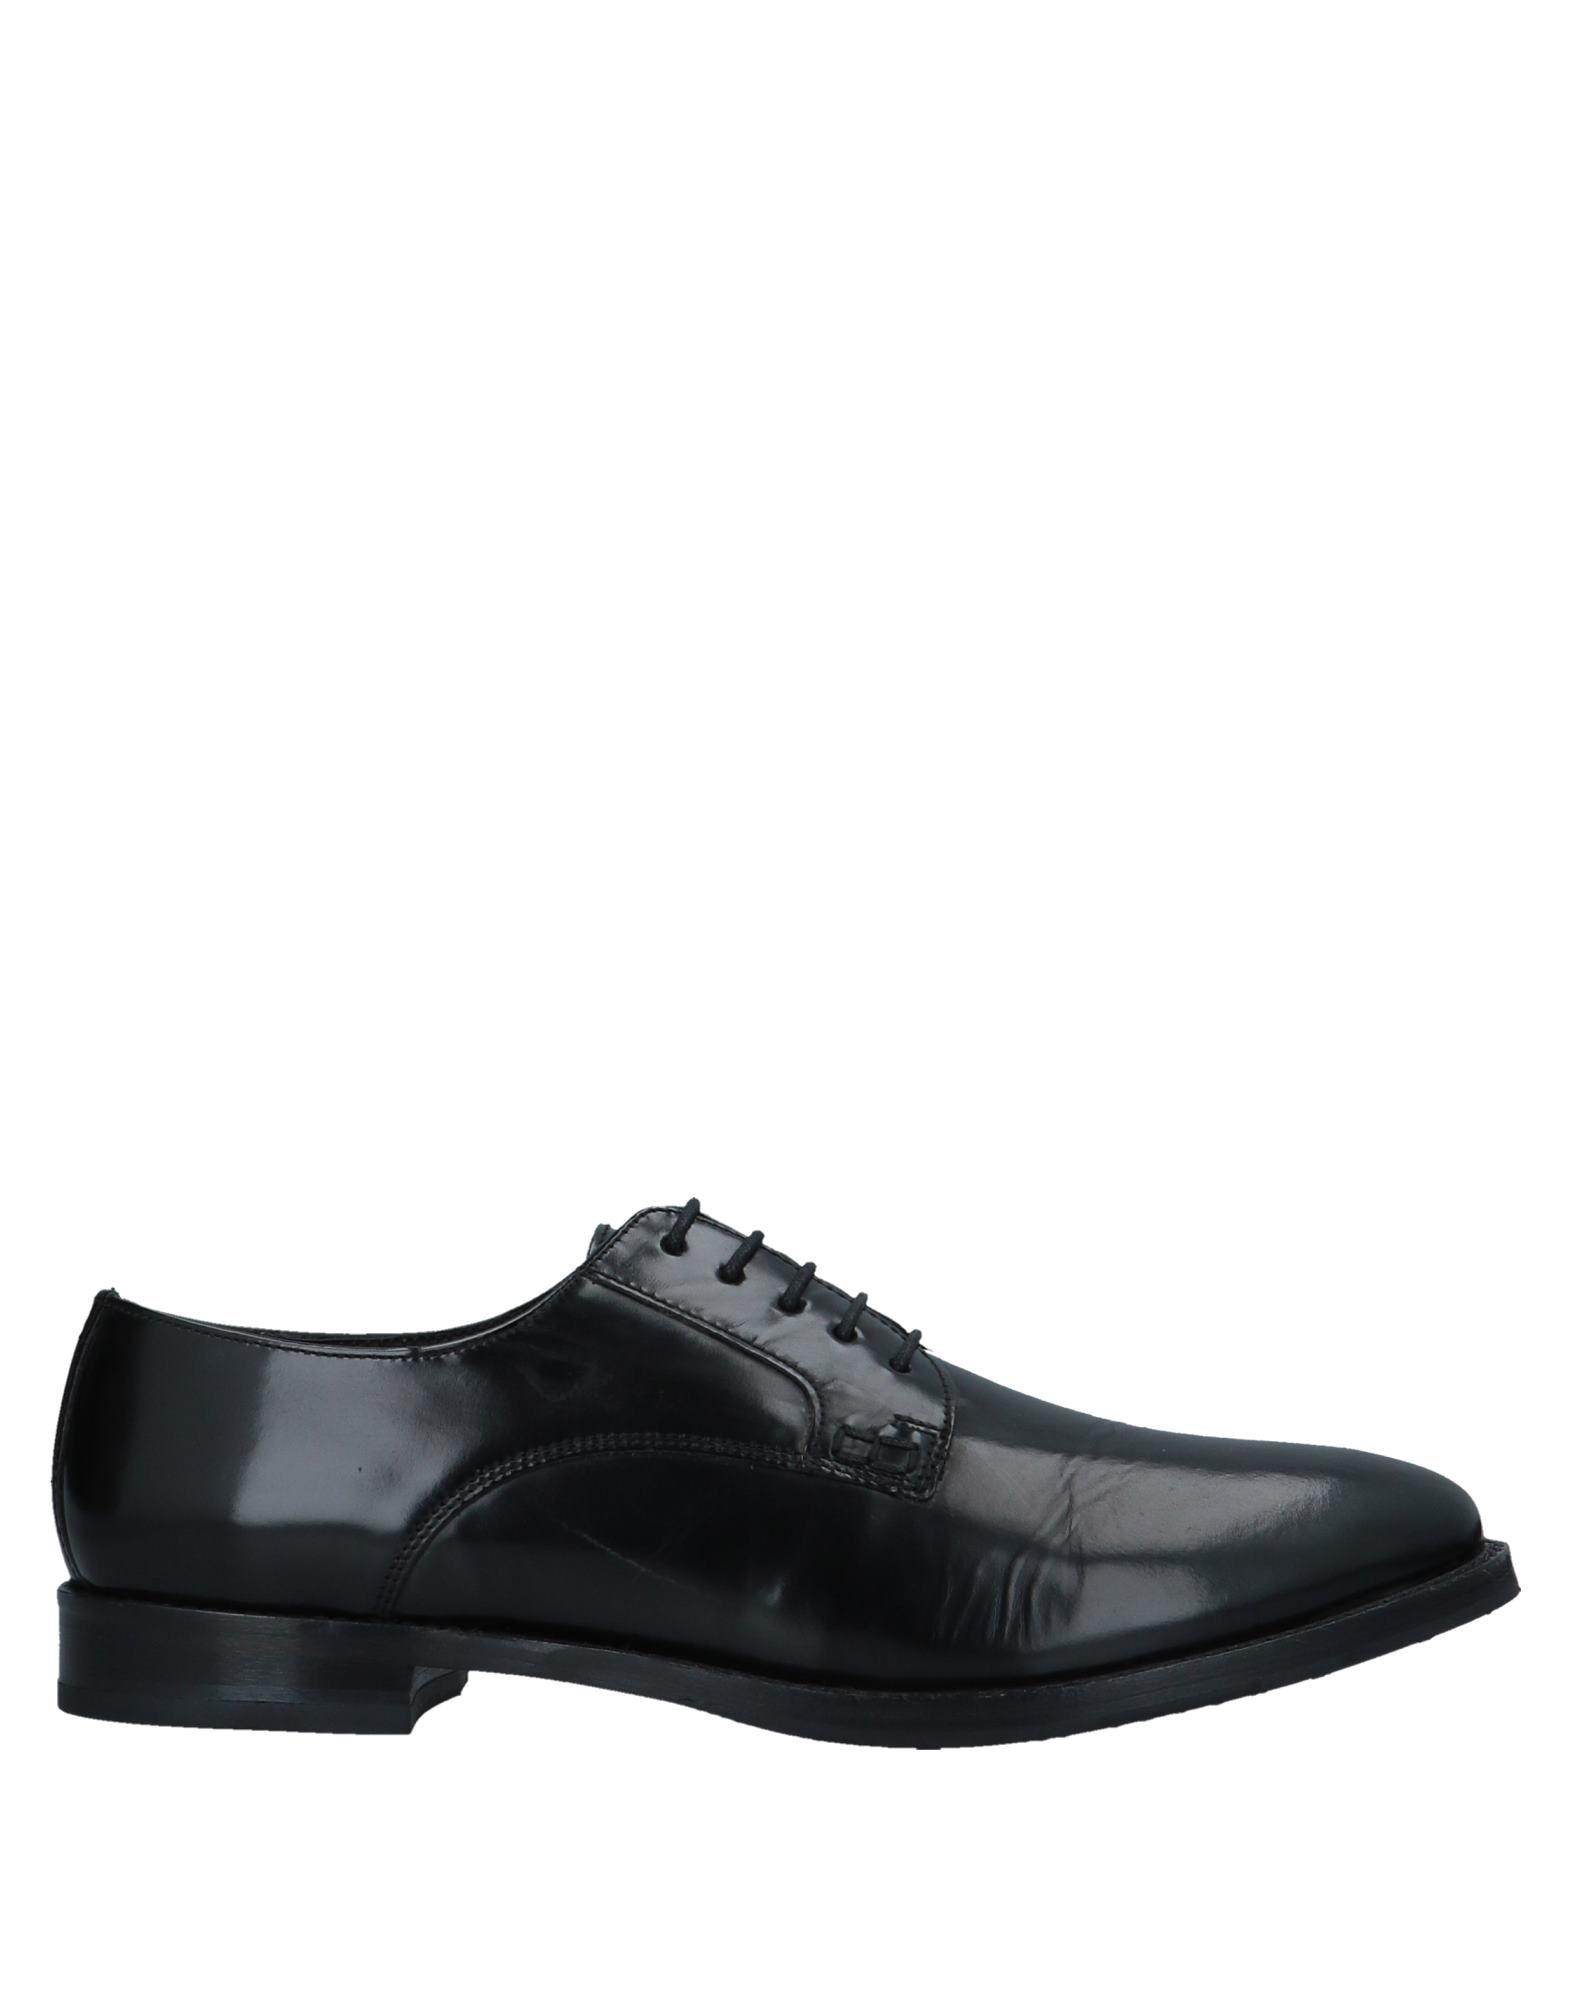 Daniela Mori Milano Schnürschuhe Damen  11544743CX Gute Qualität beliebte Schuhe